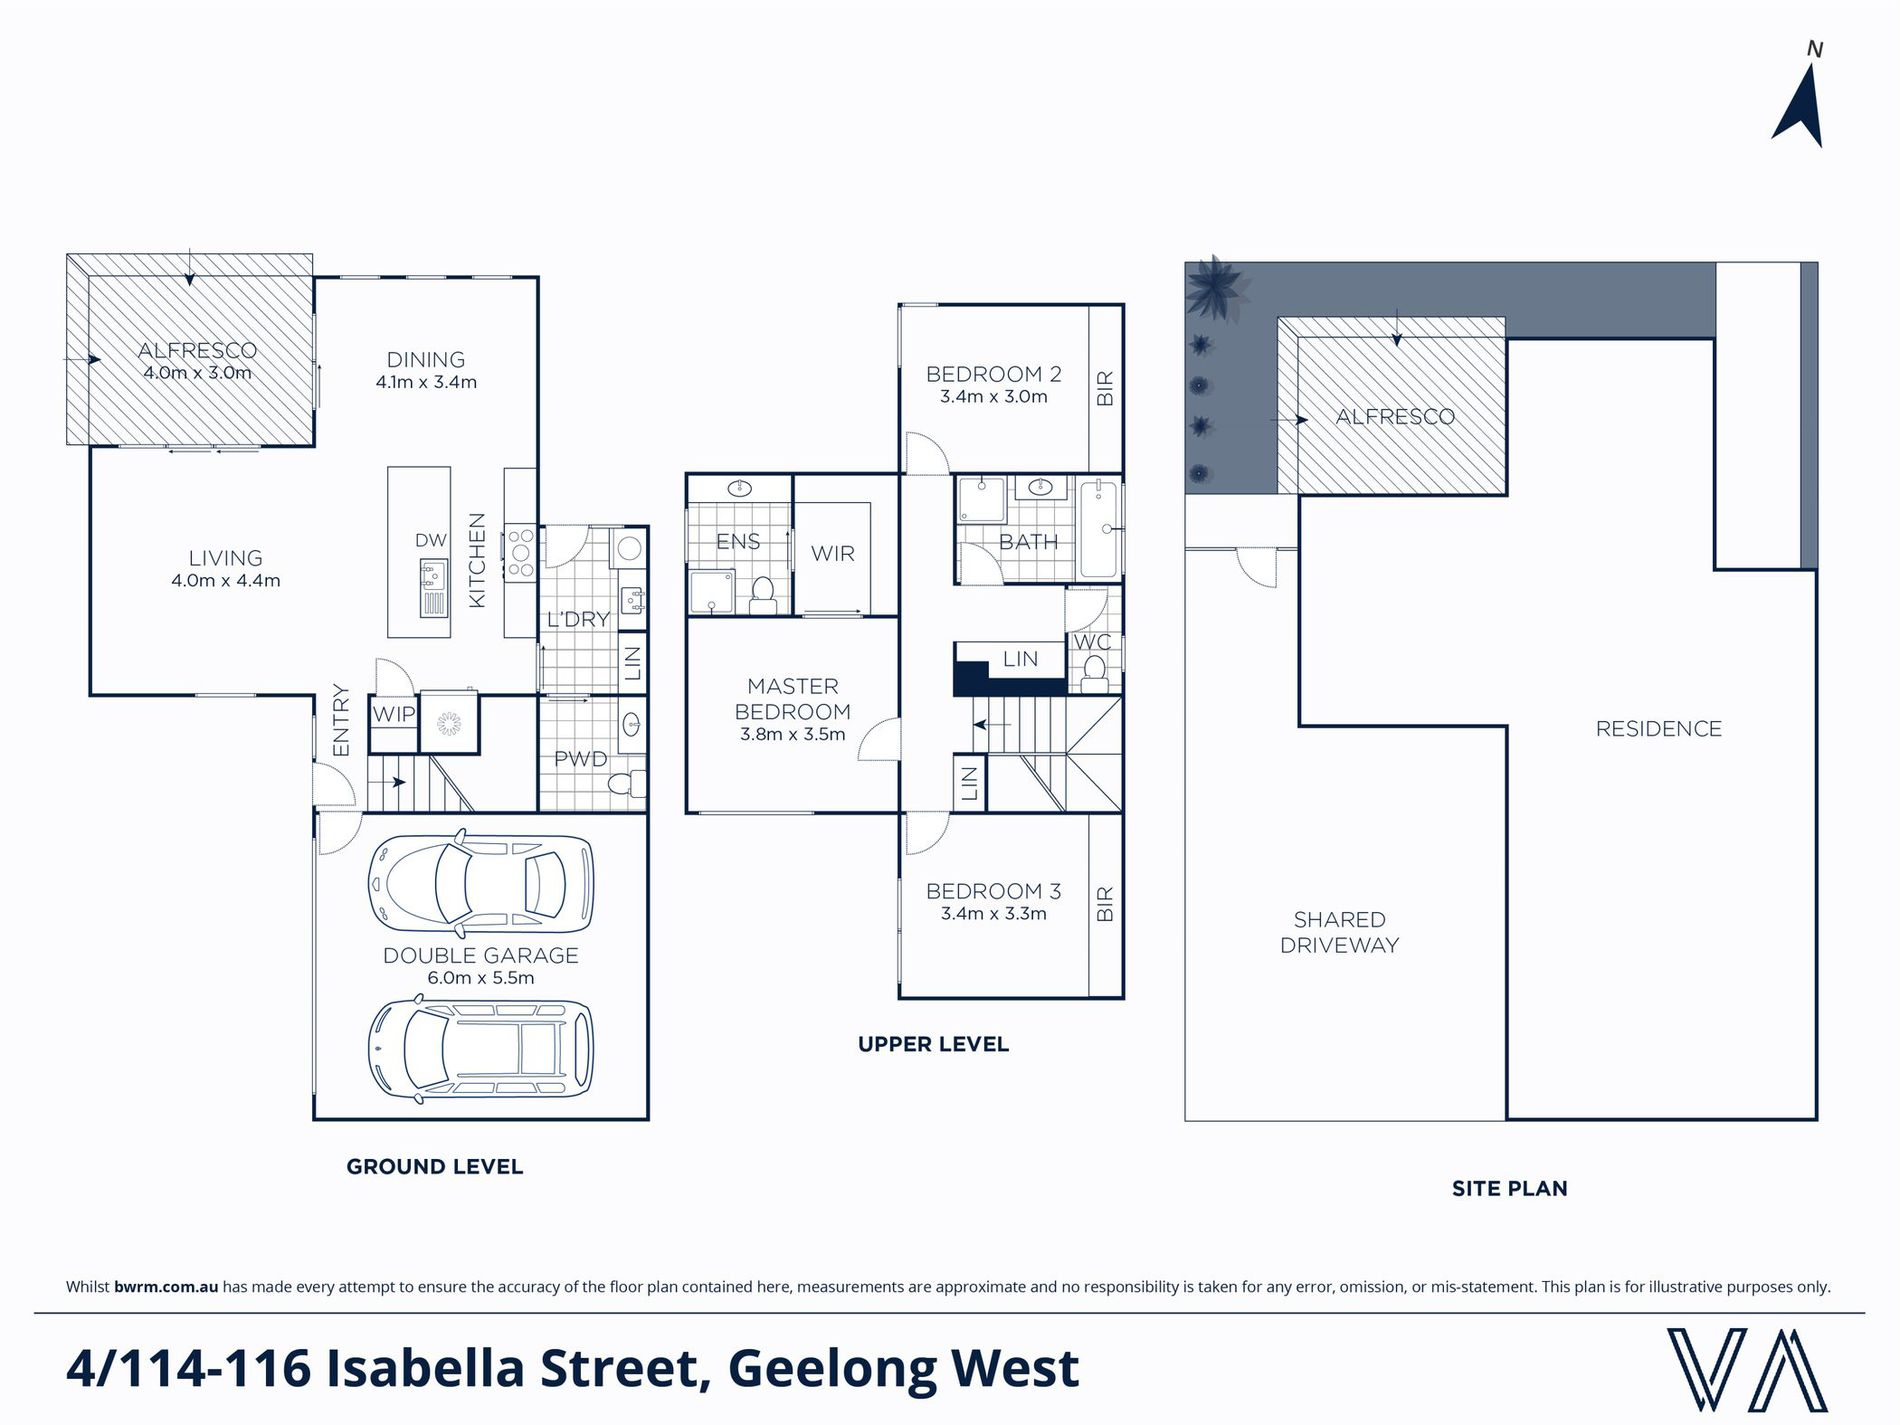 4 / 114-116 Isabella Street, Geelong West